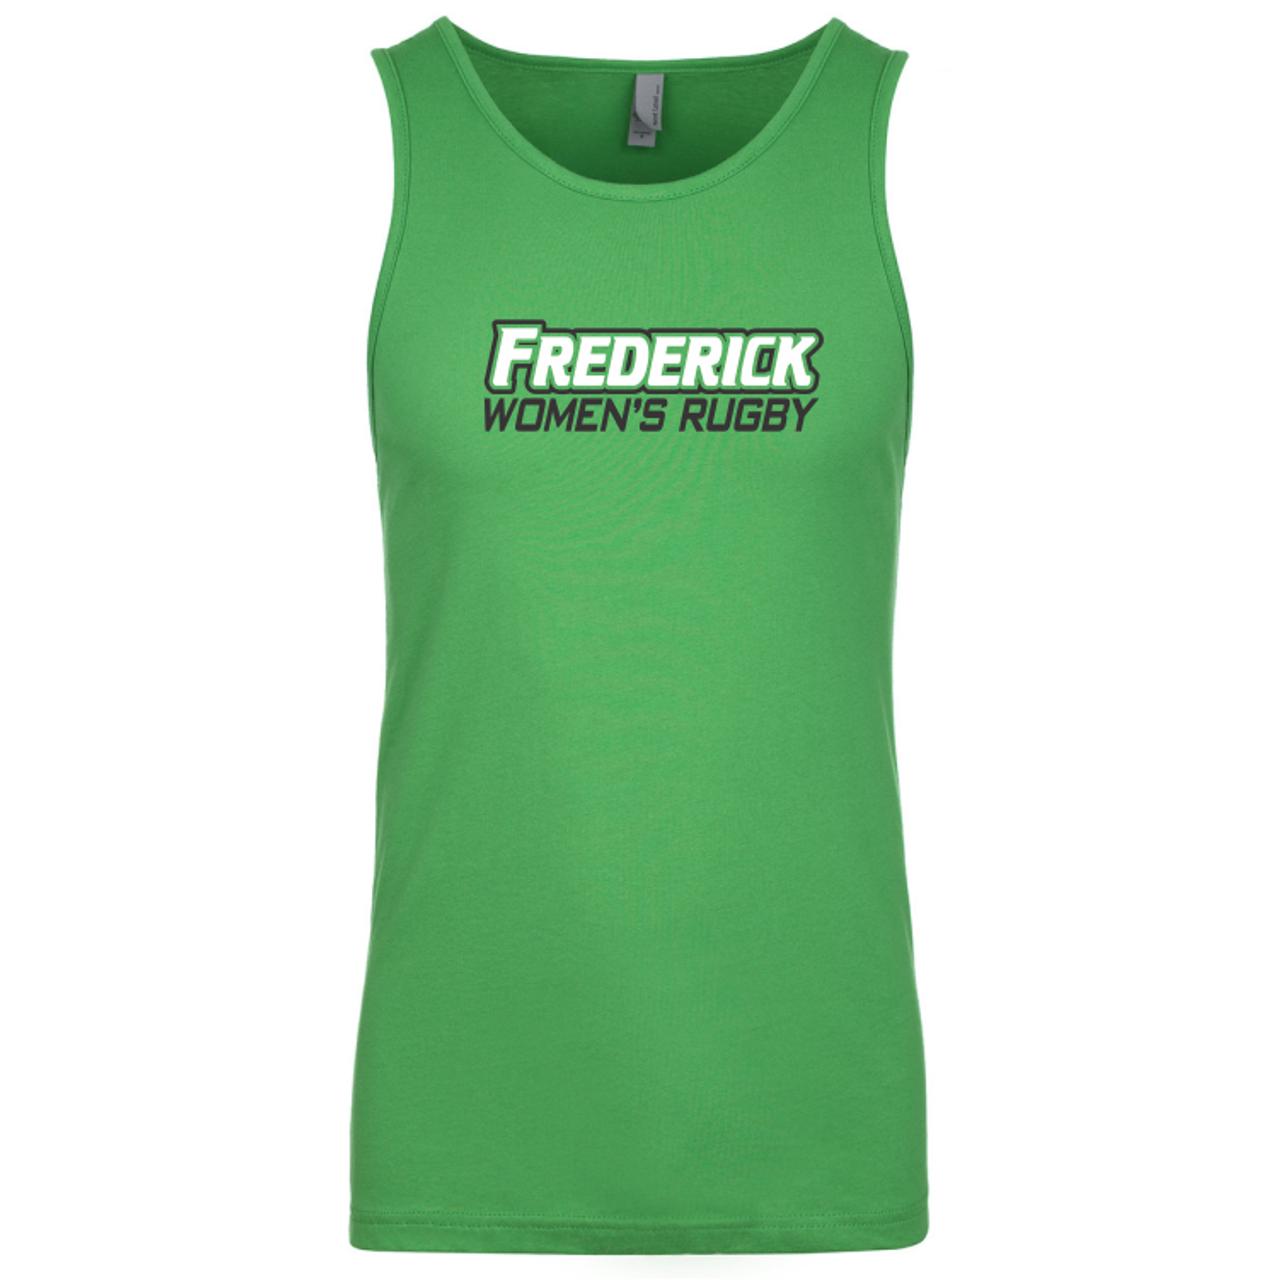 Frederick WRFC Tank,  Kelly